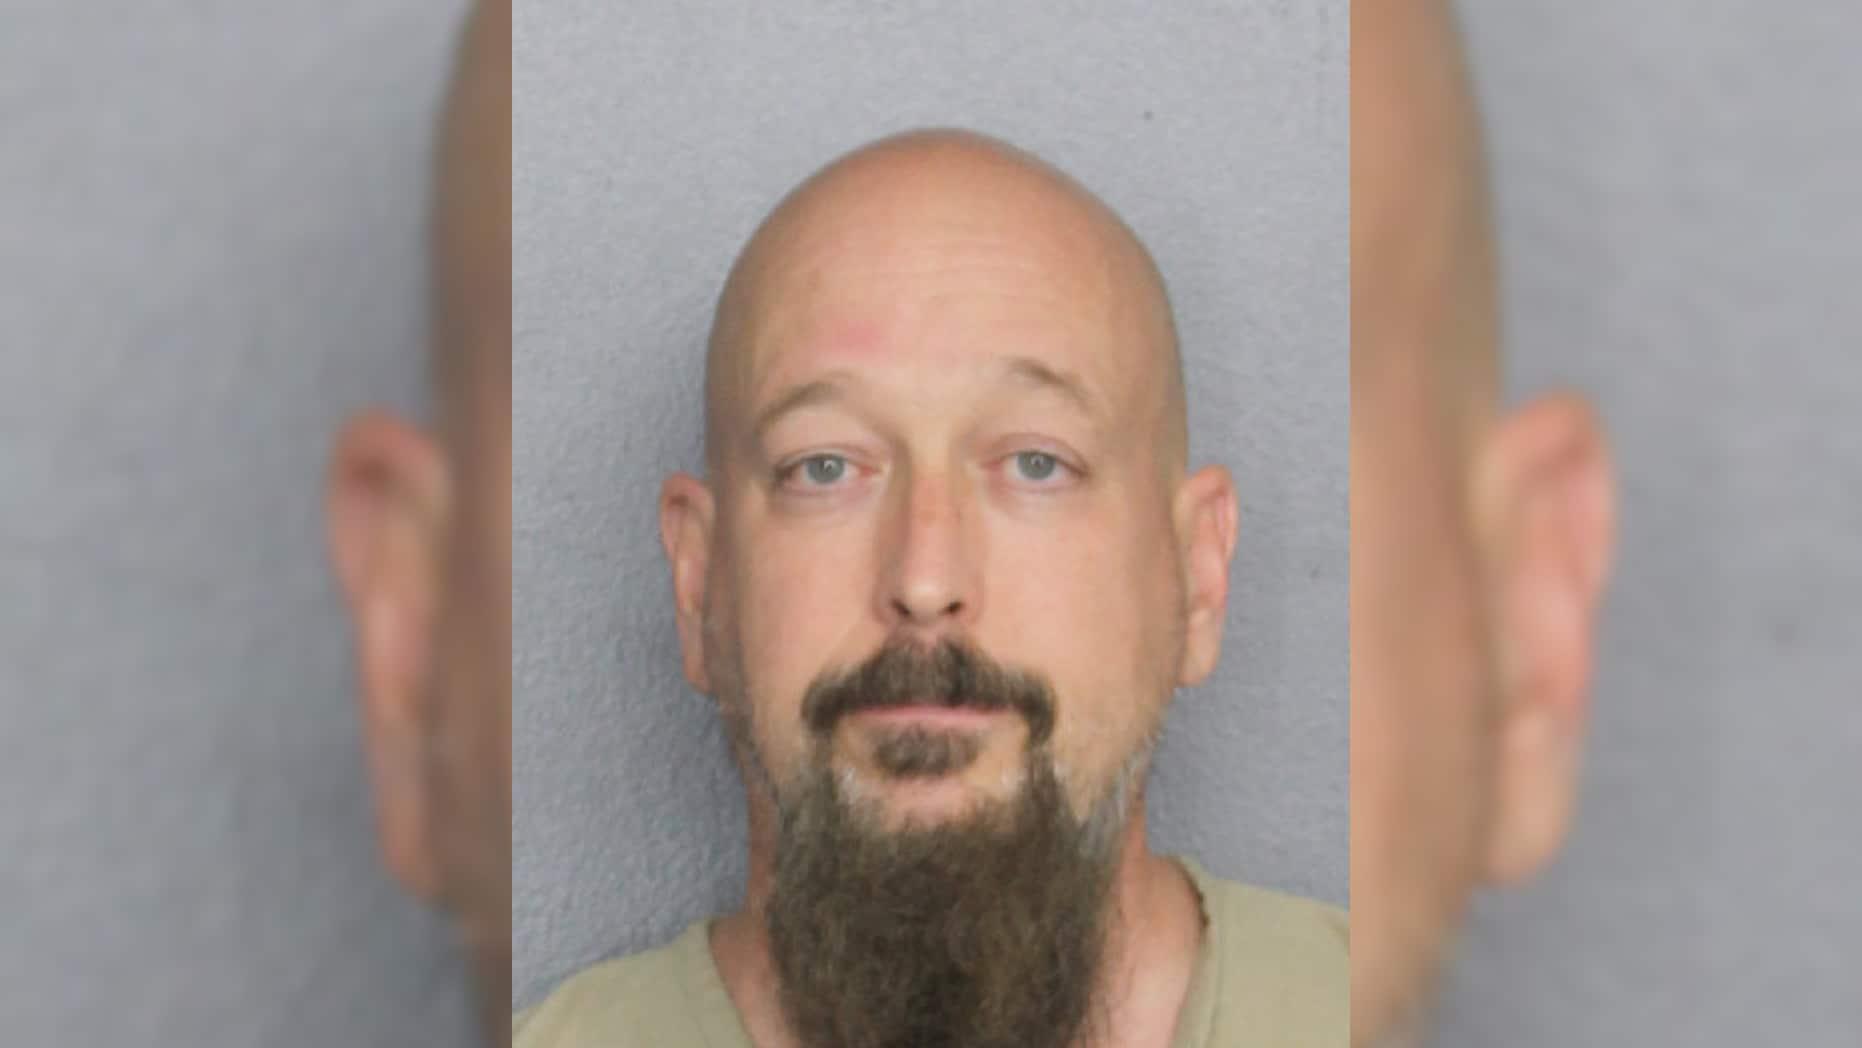 Florida Man challenge: What did Florida man do on your